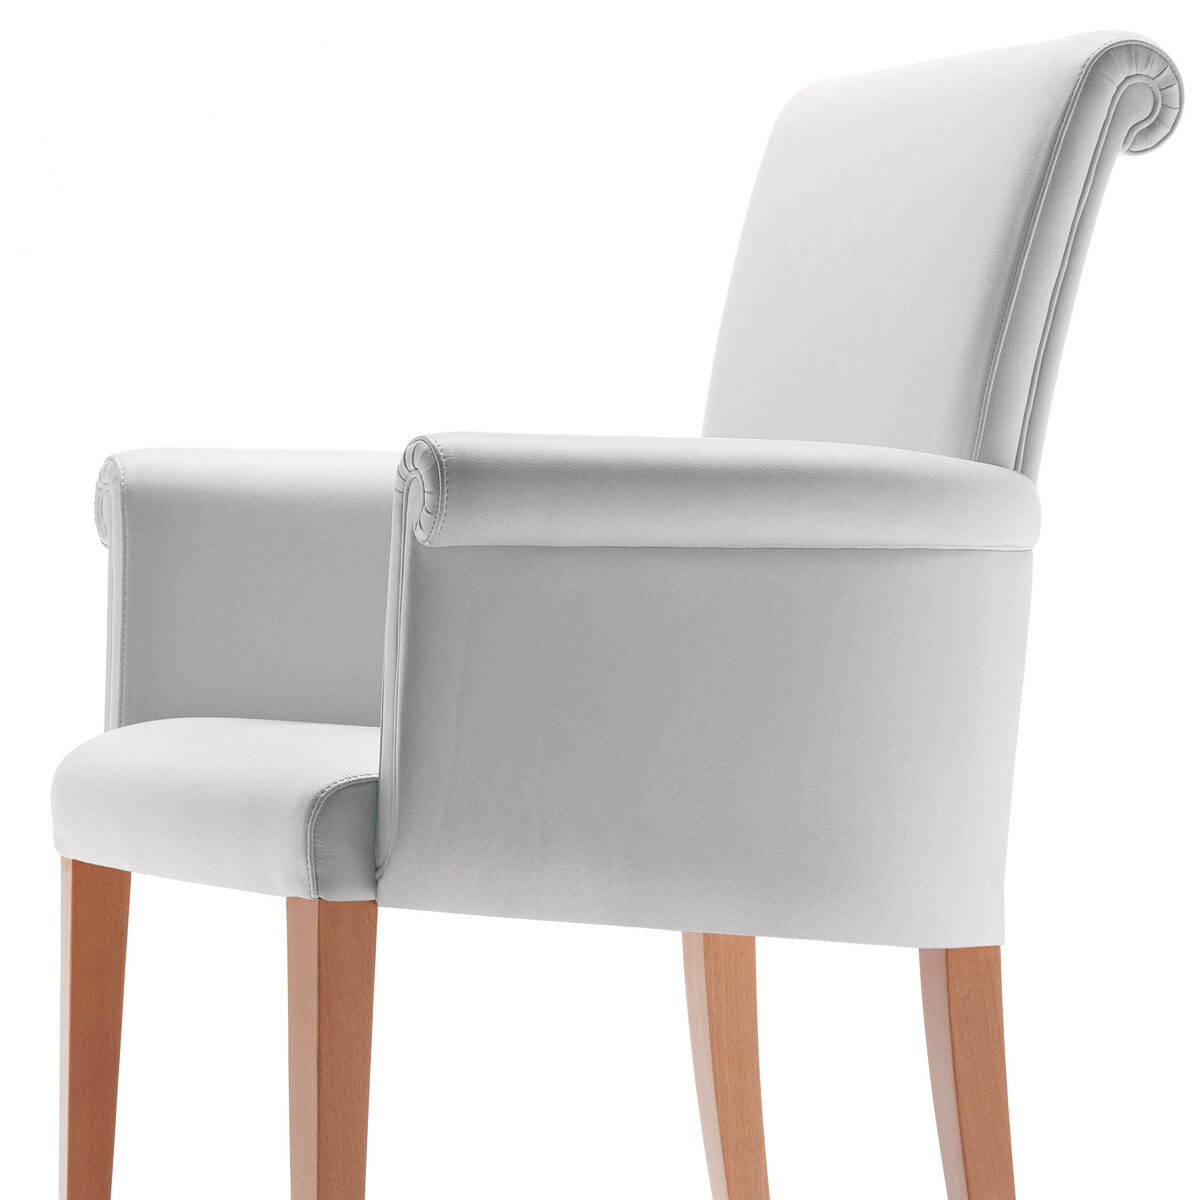 poltrona frau vittoria kleiner sessel casa de. Black Bedroom Furniture Sets. Home Design Ideas